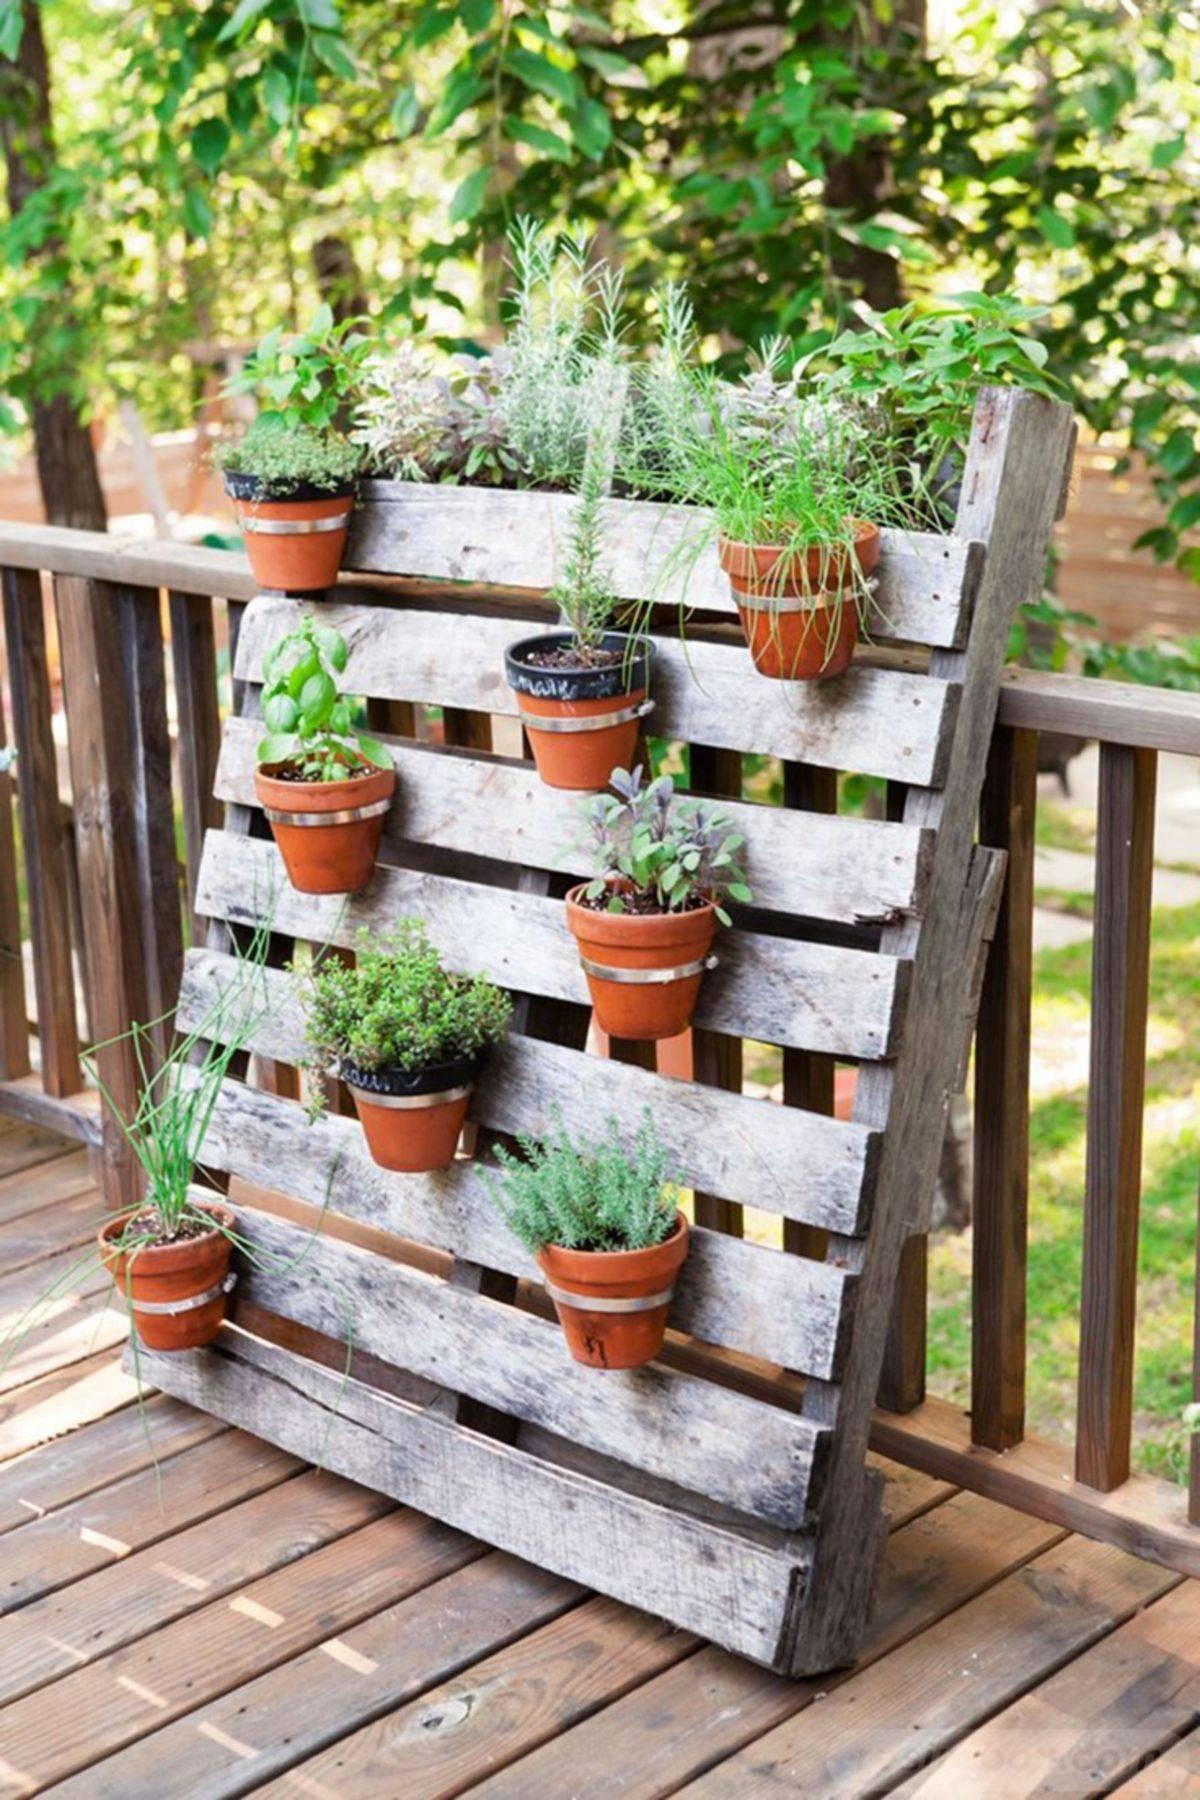 amazing garden ideas-597219600565554069